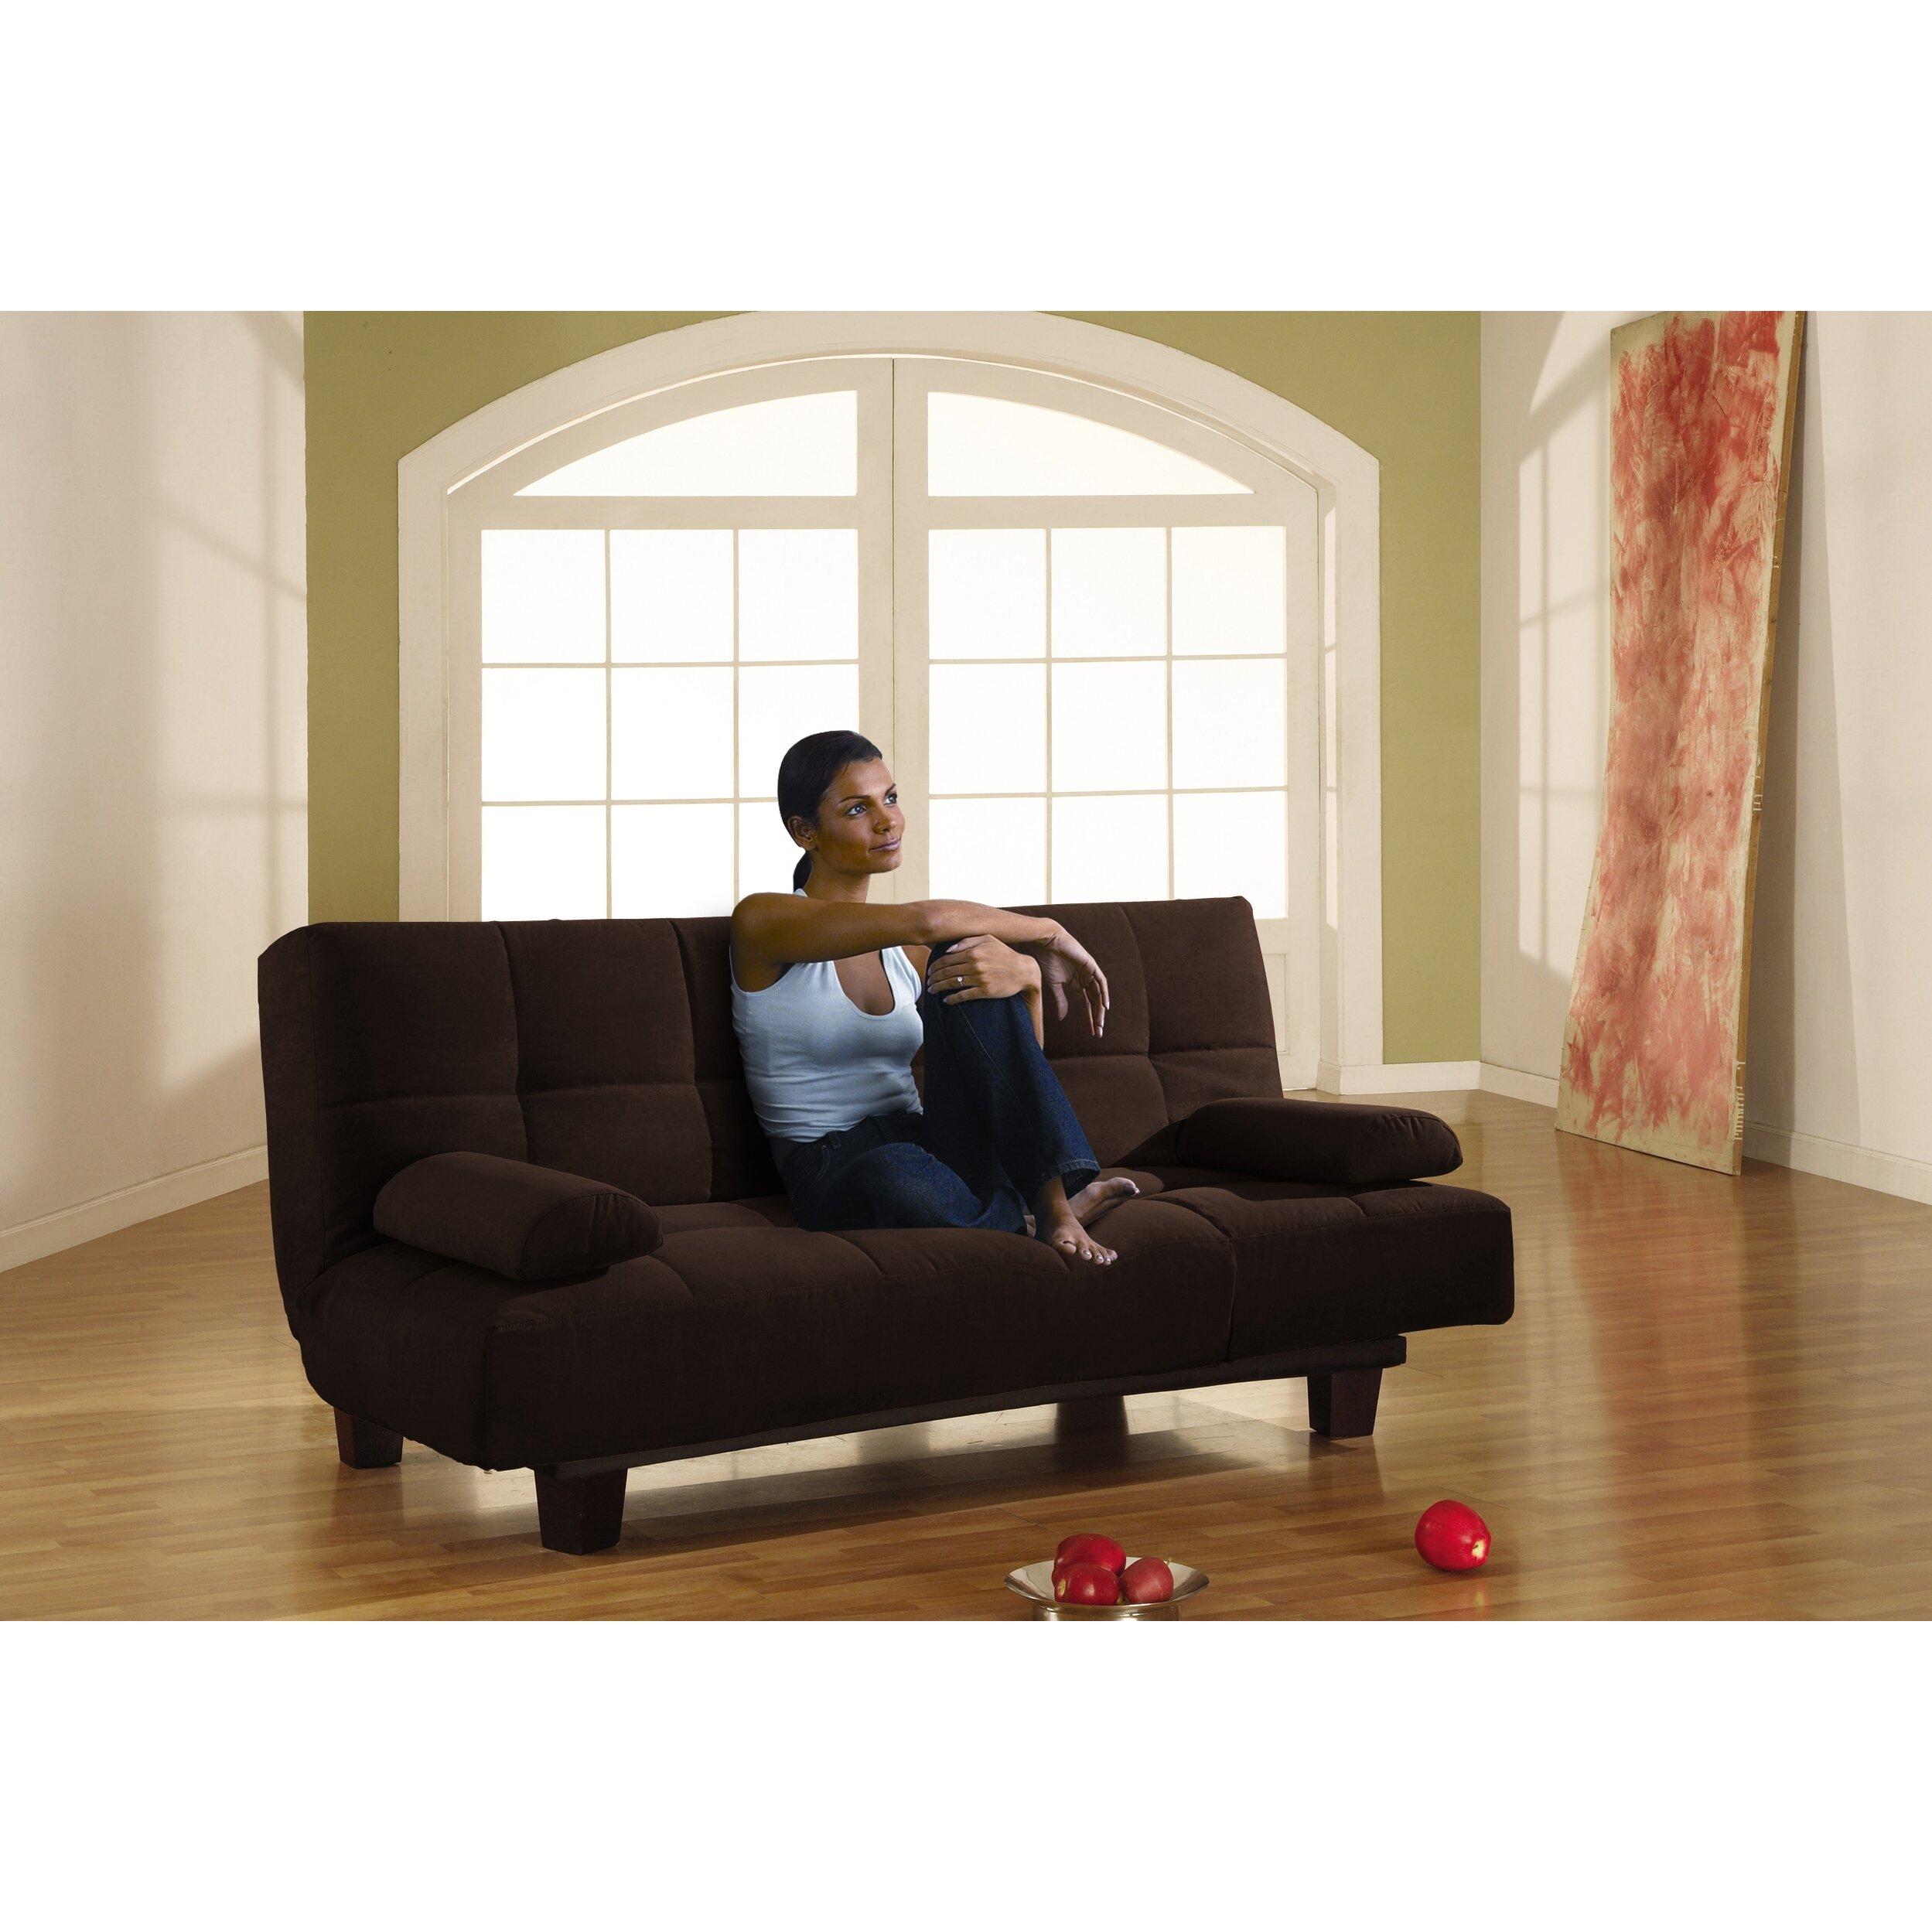 Lifestyle Solutions Serta Dream Sleeper Sofa Amp Reviews